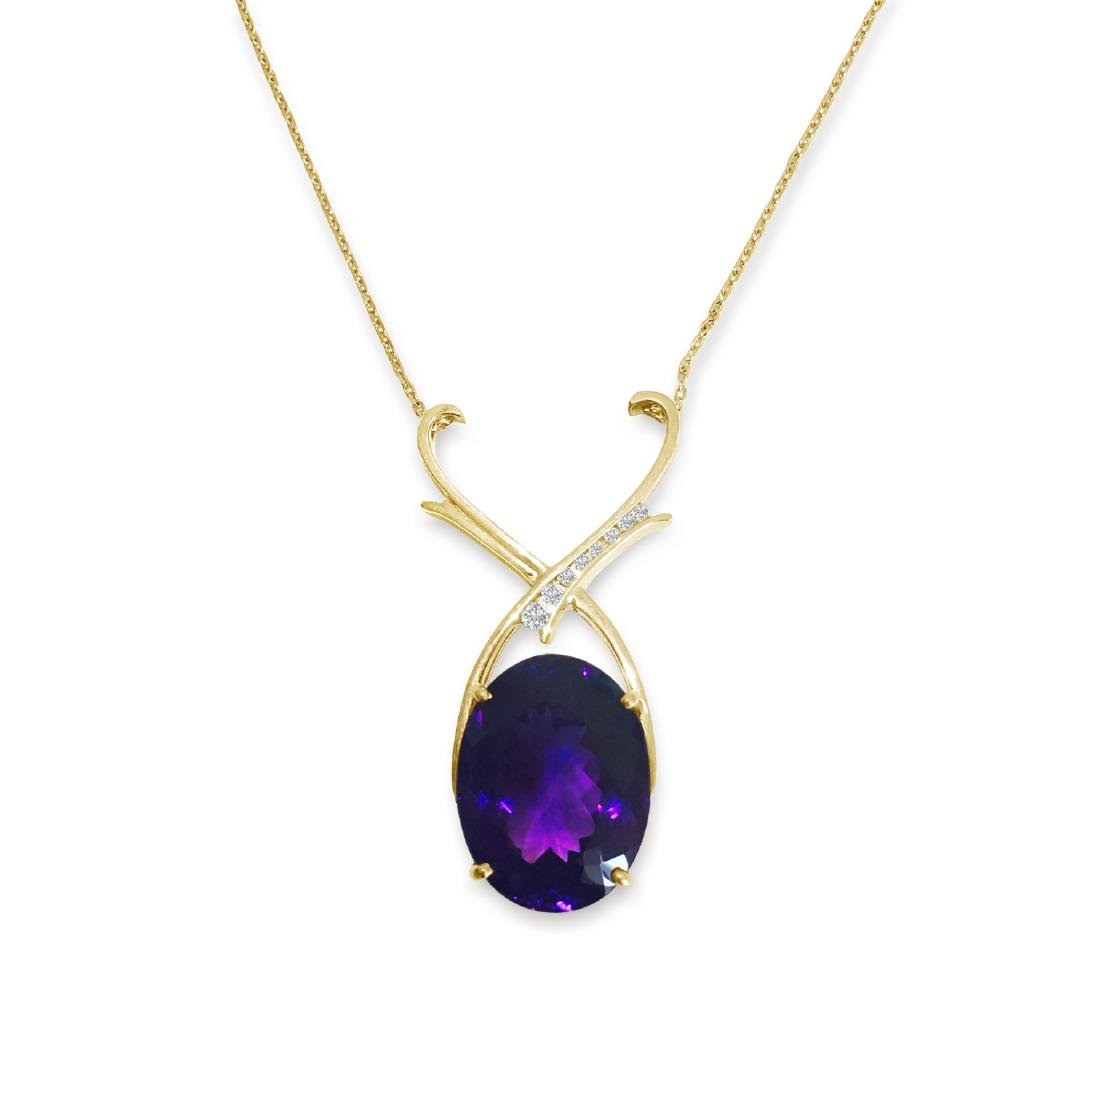 14K Gold 35 carat Amethyst & Diamond Pendant / NECKLACE